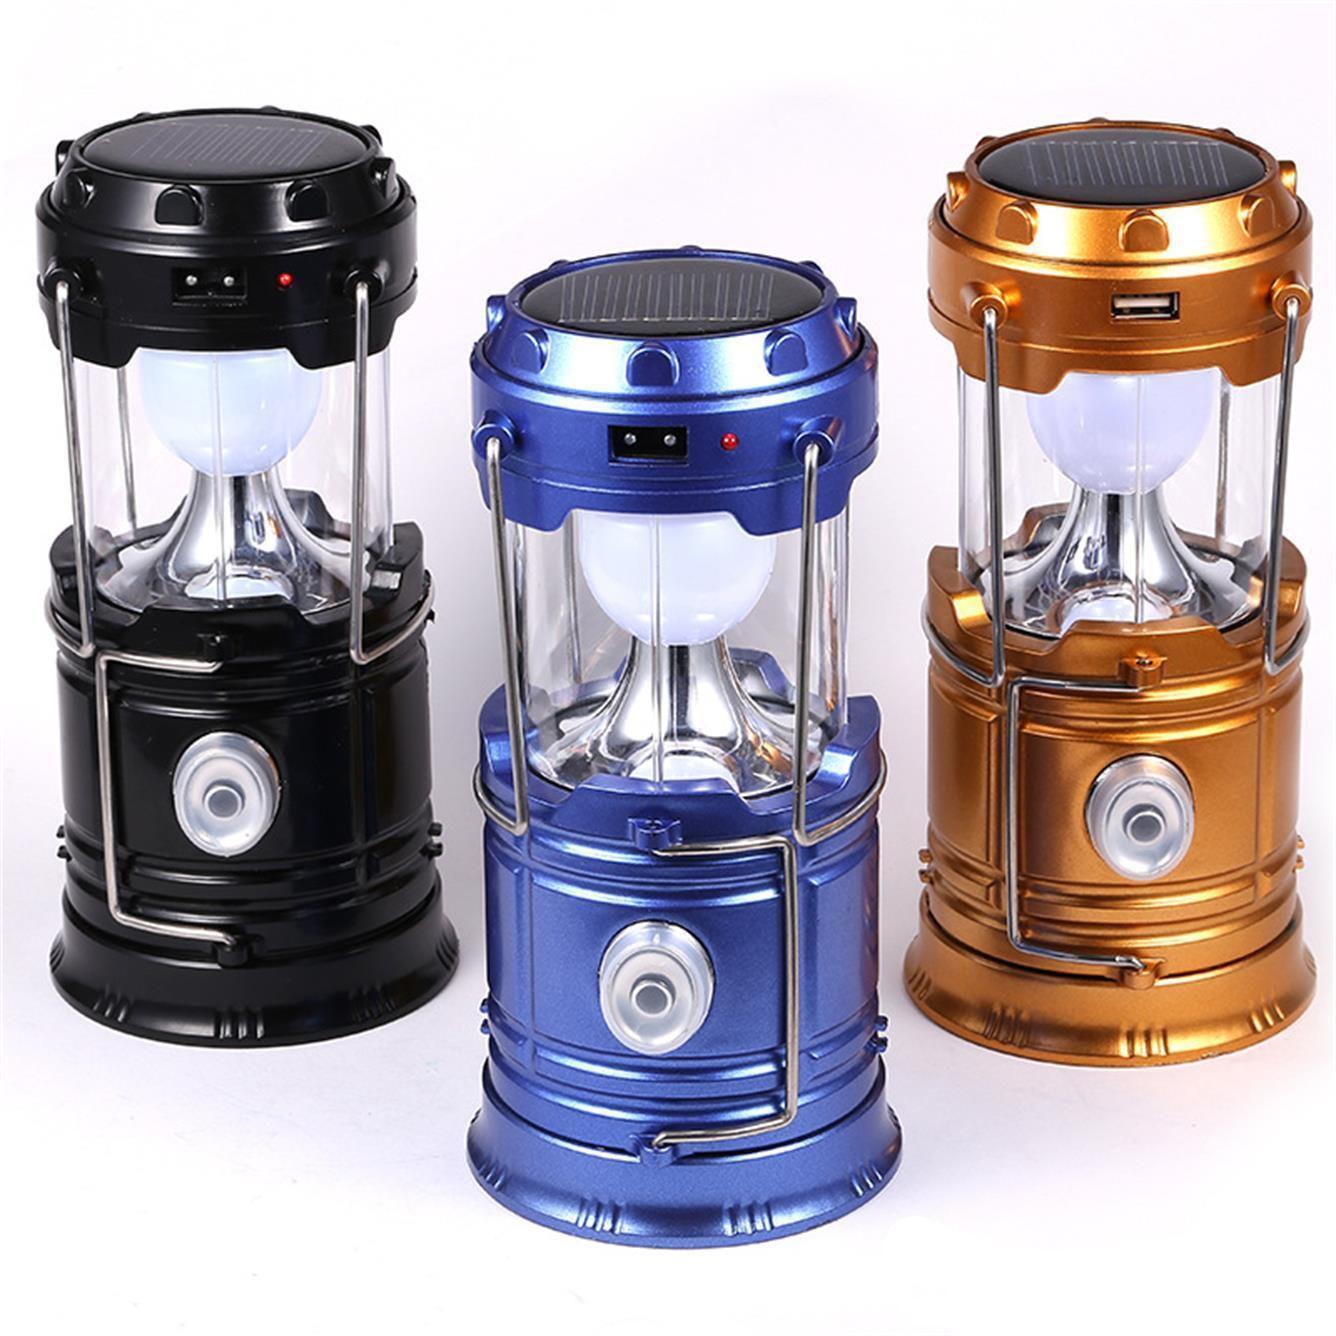 Usb Charging Led Light Linternas Portable Outdoor Camping Lamp Flashlight Lamps Folding Table Lamp Camping Lantern Choice Materials Lights & Lighting